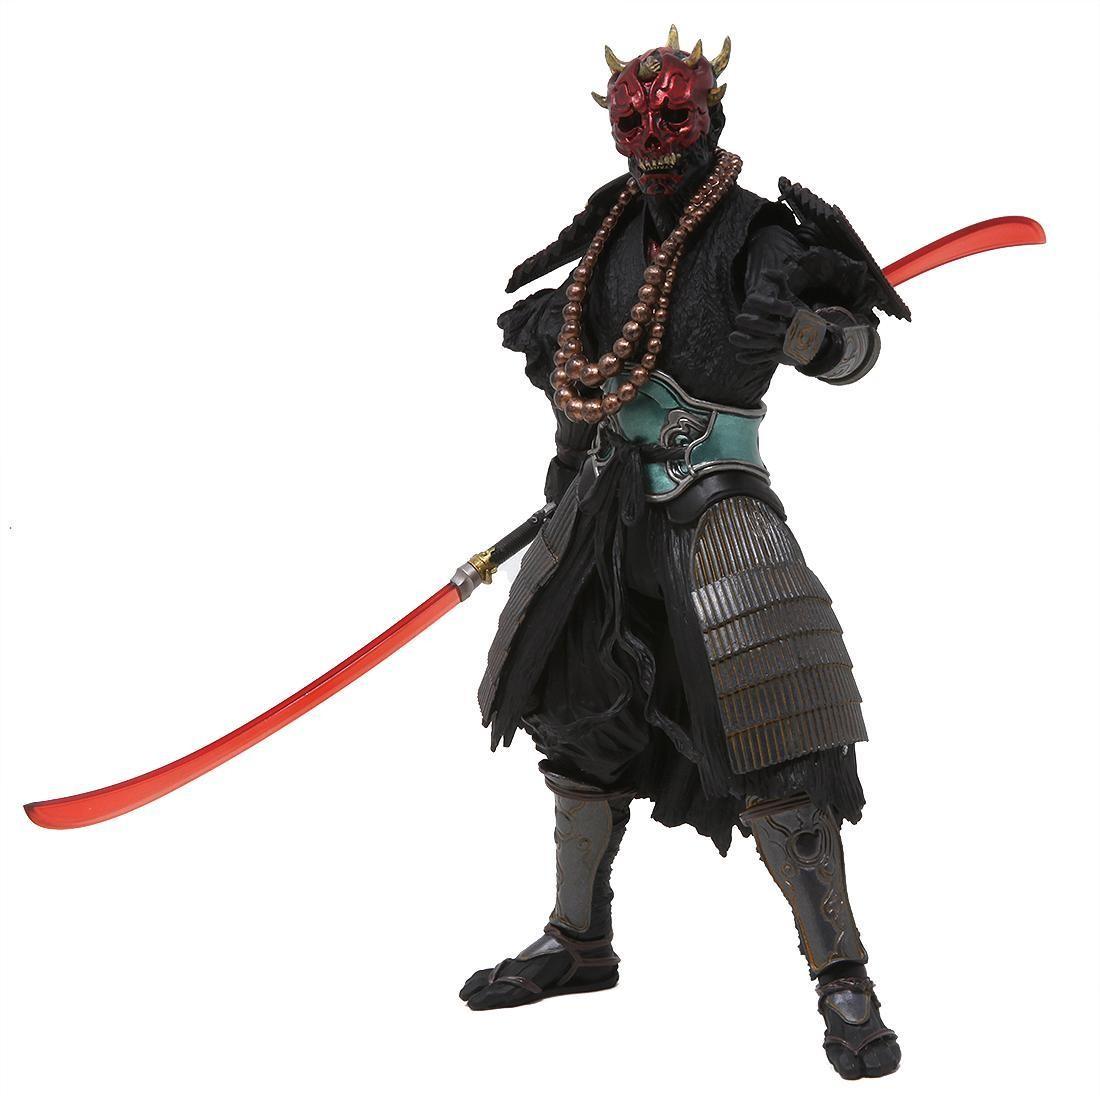 Bandai Meisho Movie Realization Star Wars Sohei Darth Maul Figure (black)